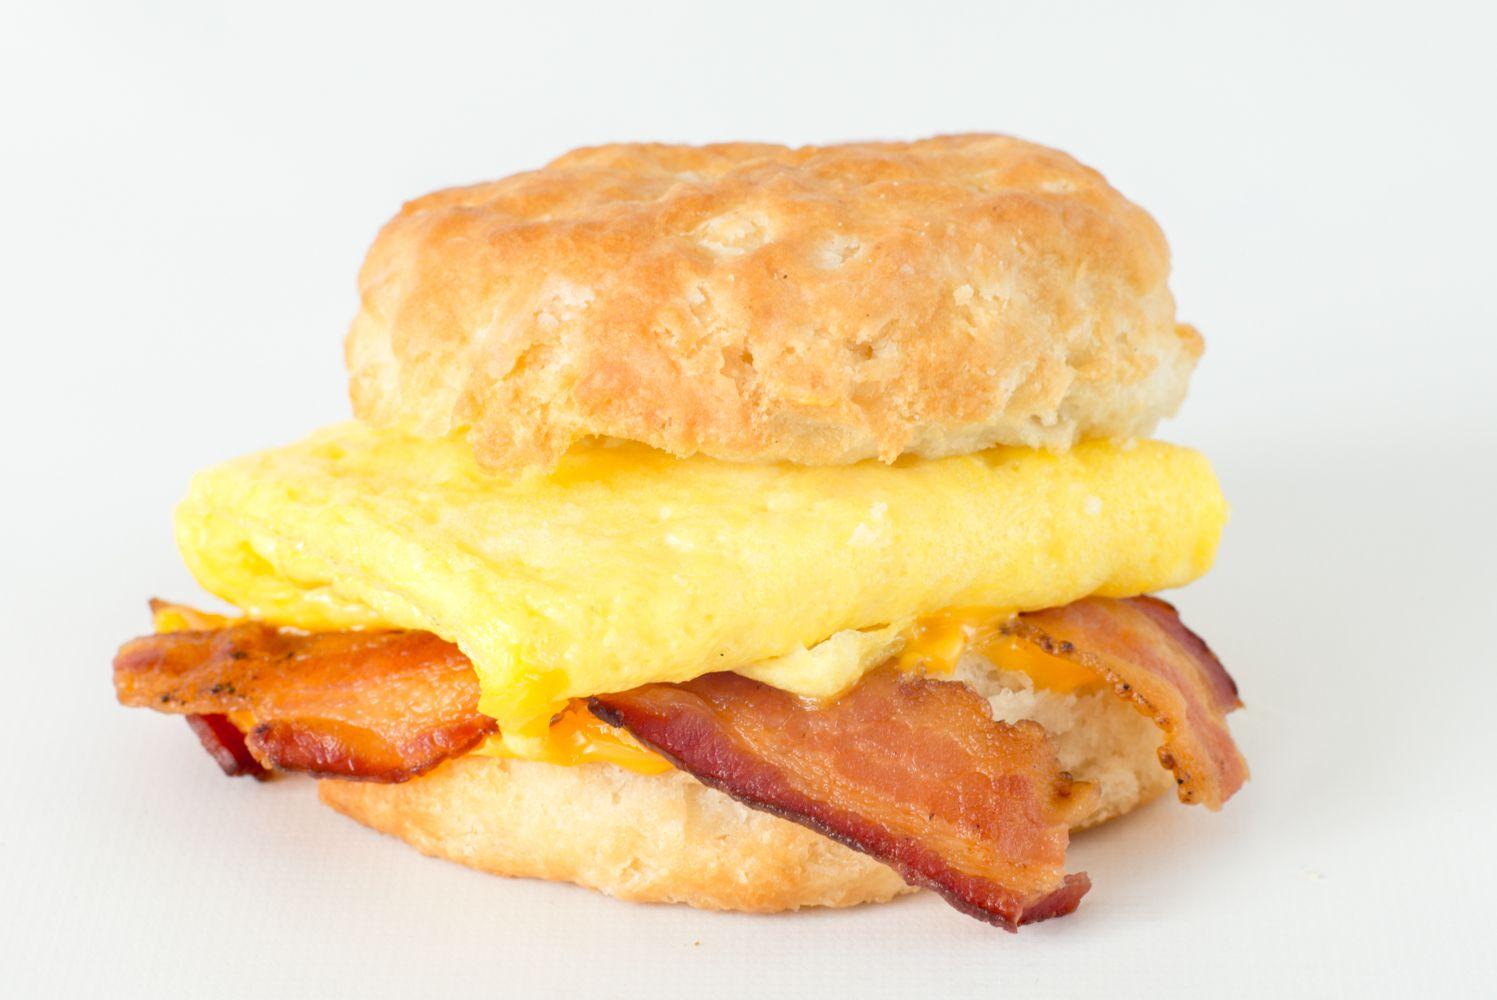 McDonald's Breakfast Menu, Ranked - Eater